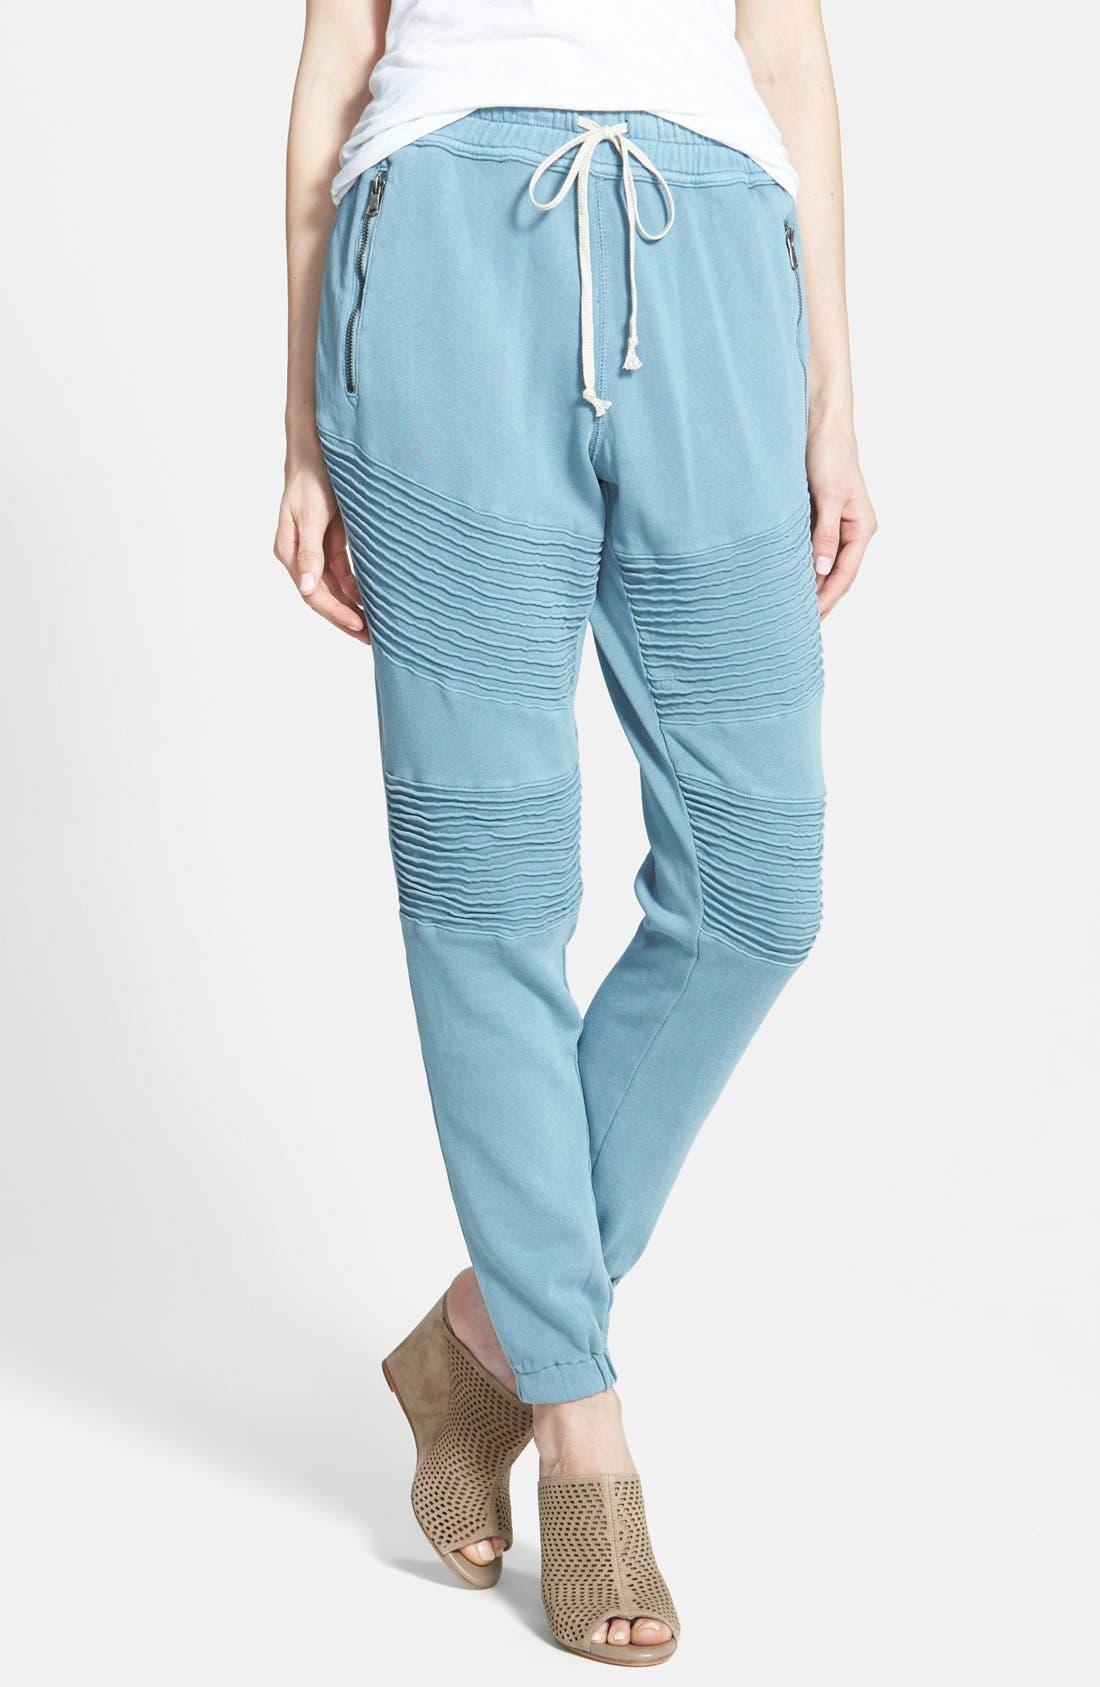 Alternate Image 1 Selected - Hudson Jeans 'Avery' Moto Sweatpants